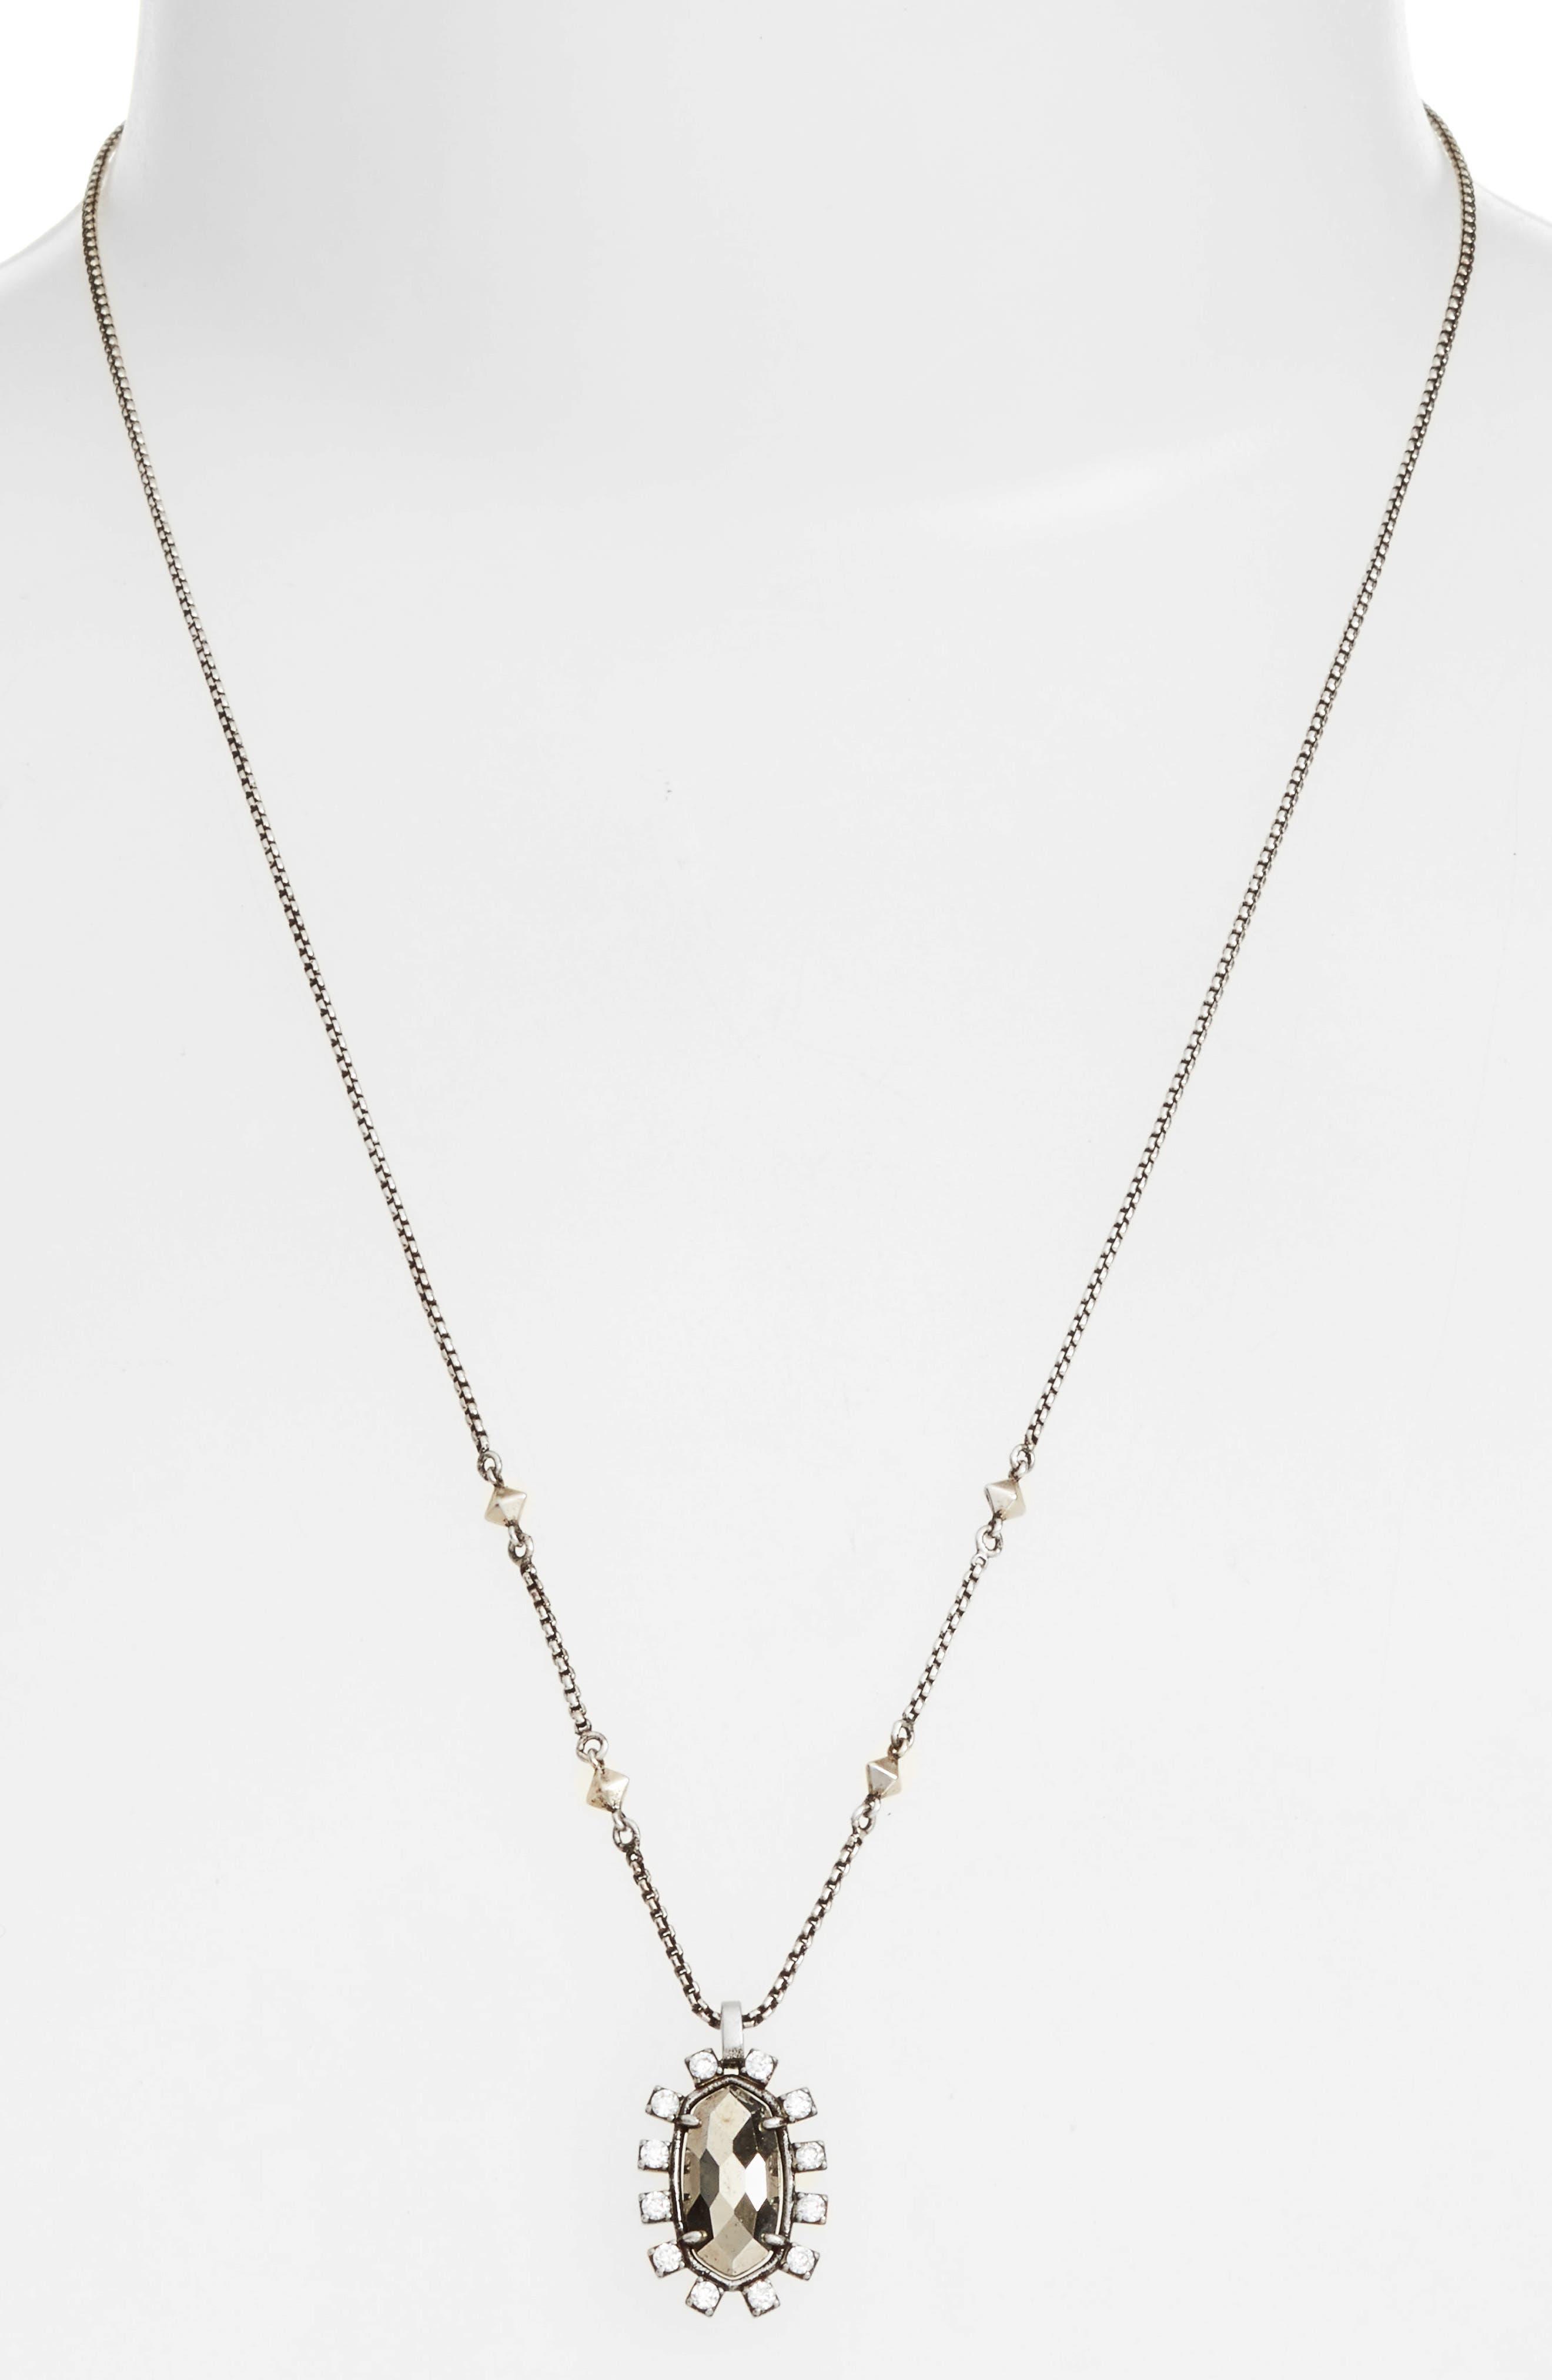 Kendra Scott Convertible Pendant Necklace